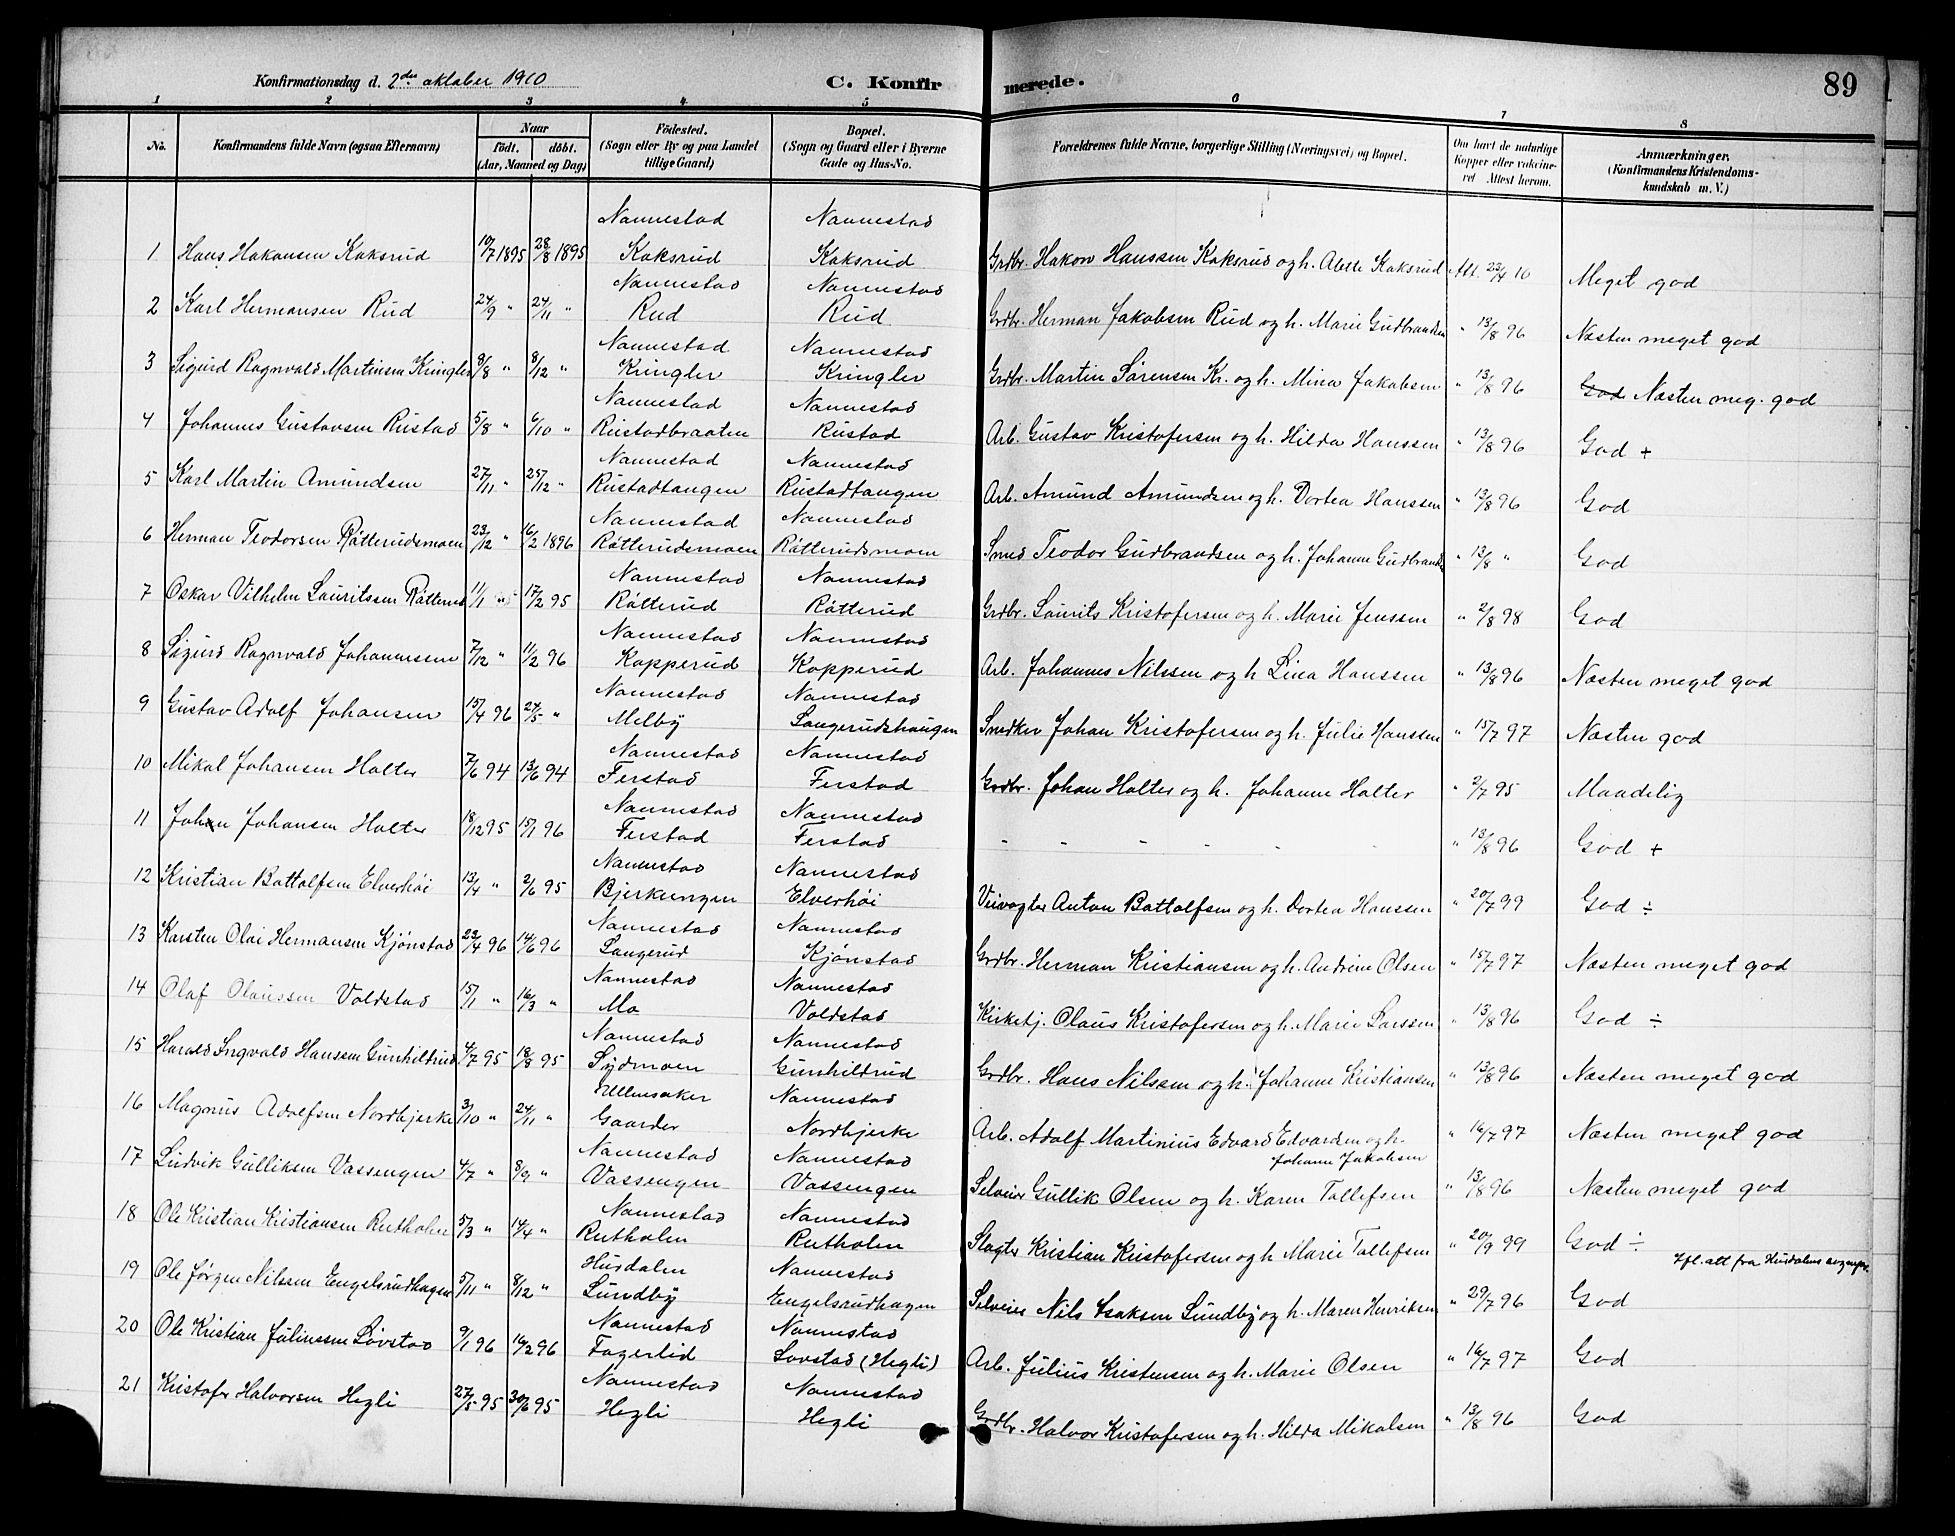 SAO, Nannestad prestekontor Kirkebøker, G/Ga/L0002: Klokkerbok nr. I 2, 1901-1913, s. 89